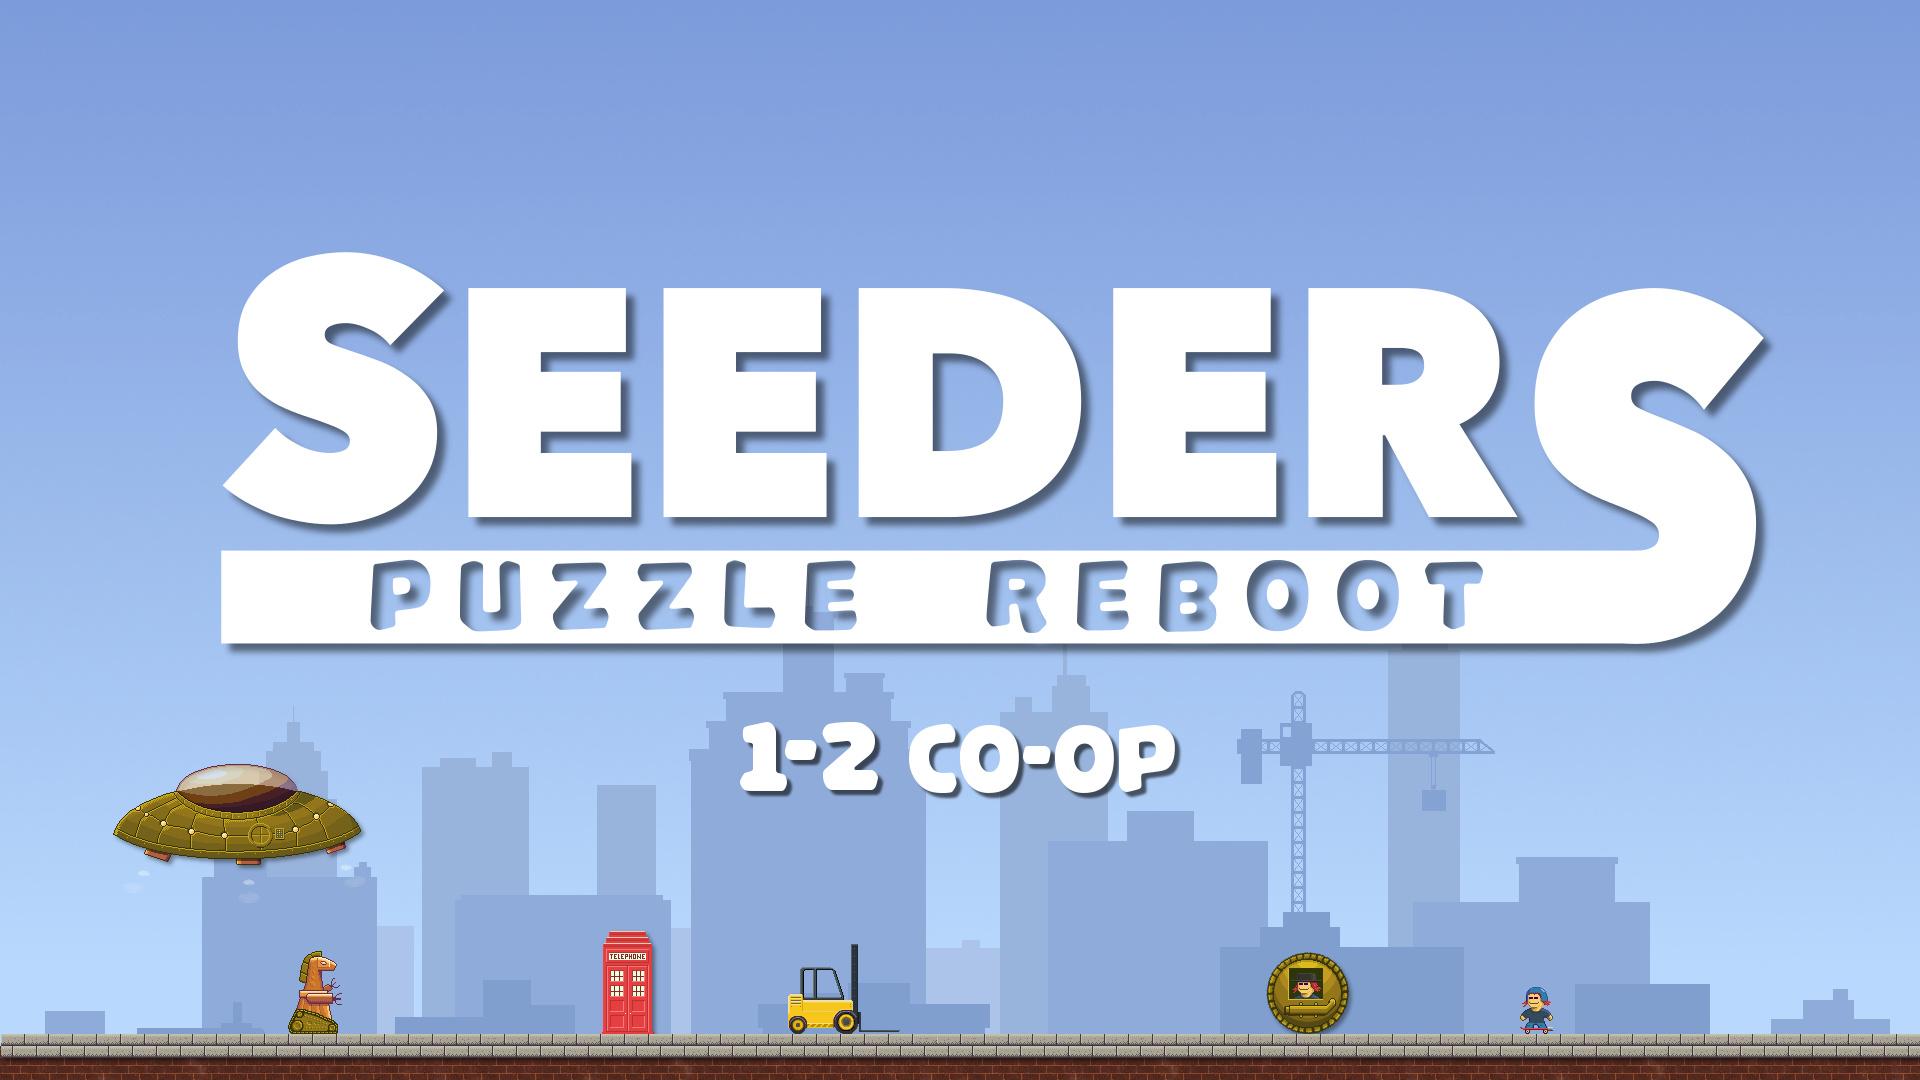 Seeders Puzzle Reboot - Nintendo Switch digital download - $0.02